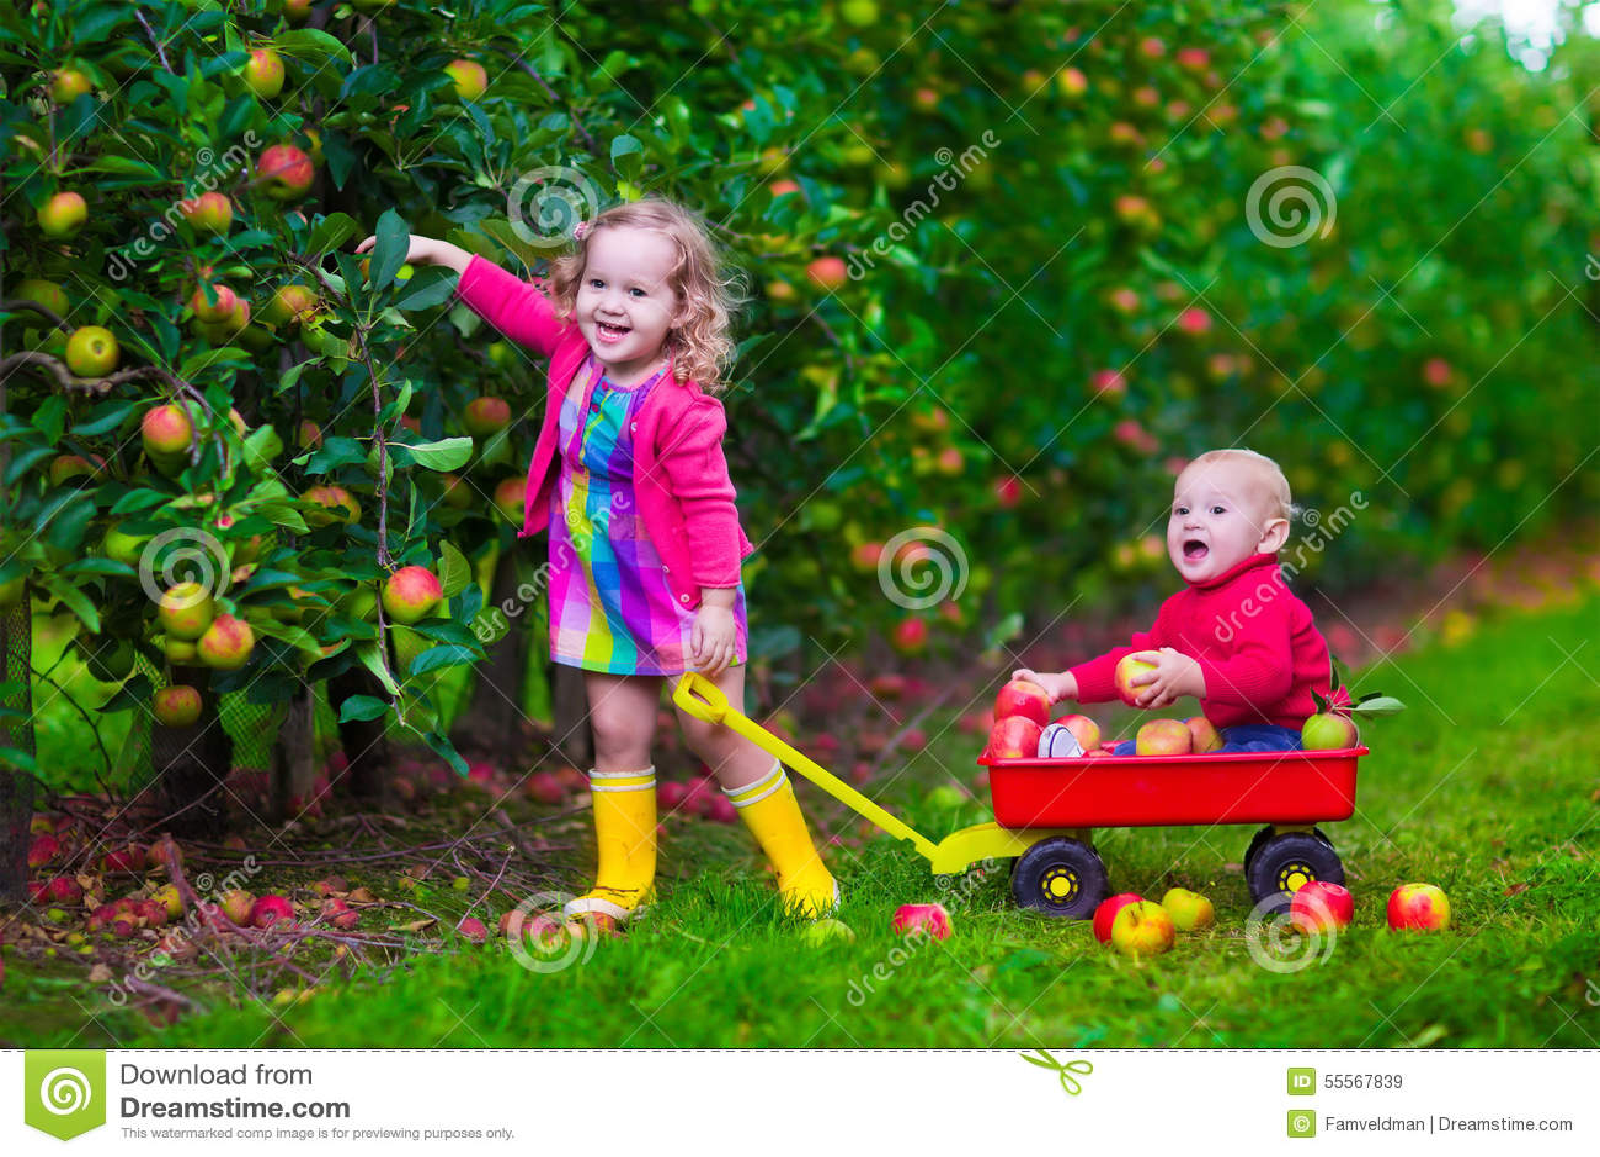 Kids picking apple on a farm